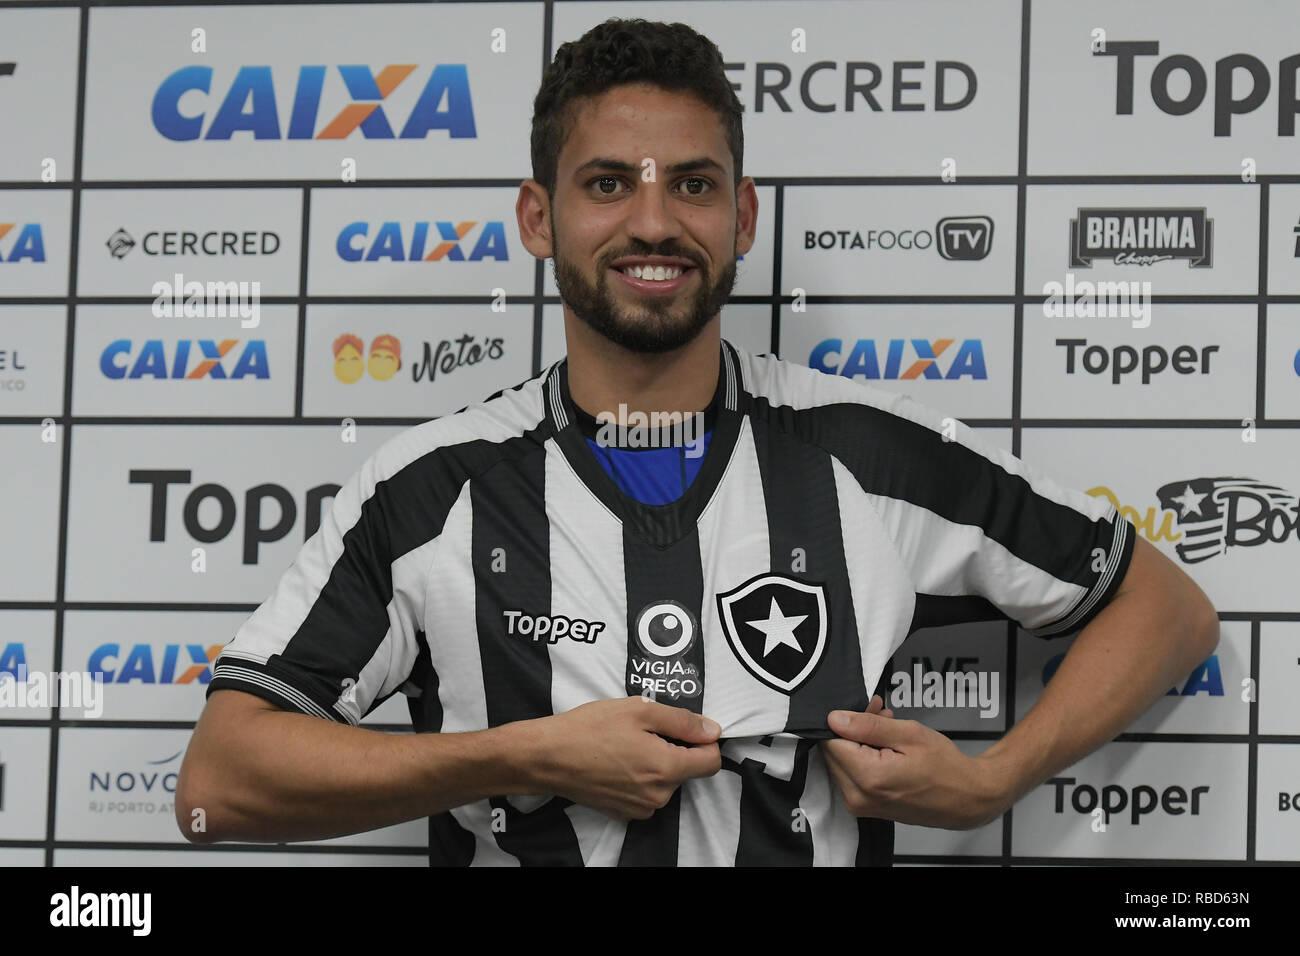 c4afcbfac37 Rio de Janeiro - 09 01 2019 - Presentation Gabriel in Botafogo - Gabriel  during his official presentation at Botafogo in a collective at the stadium  of ...